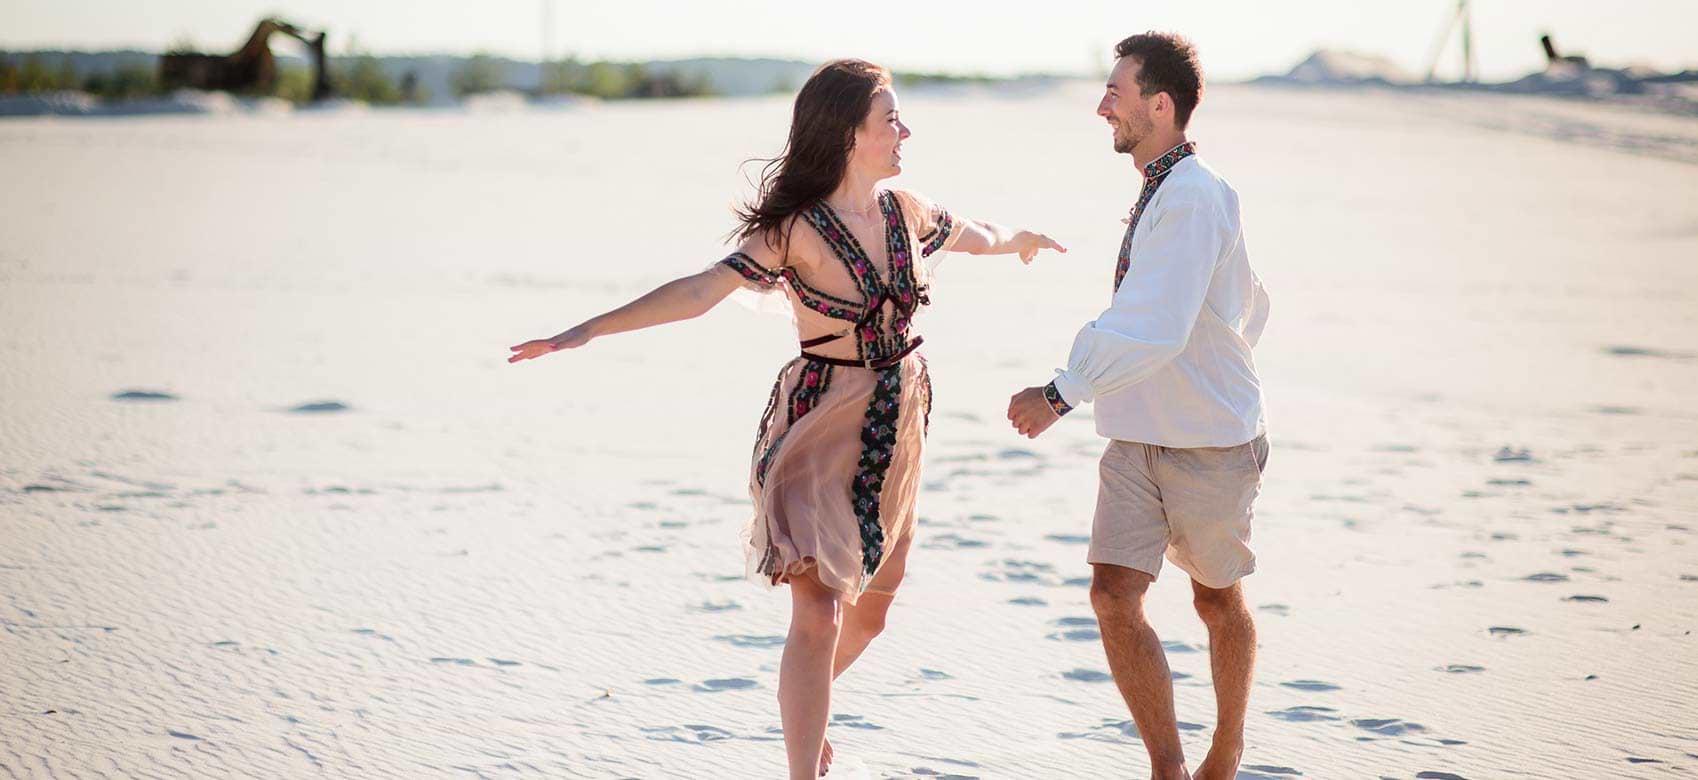 Par dansar på strand